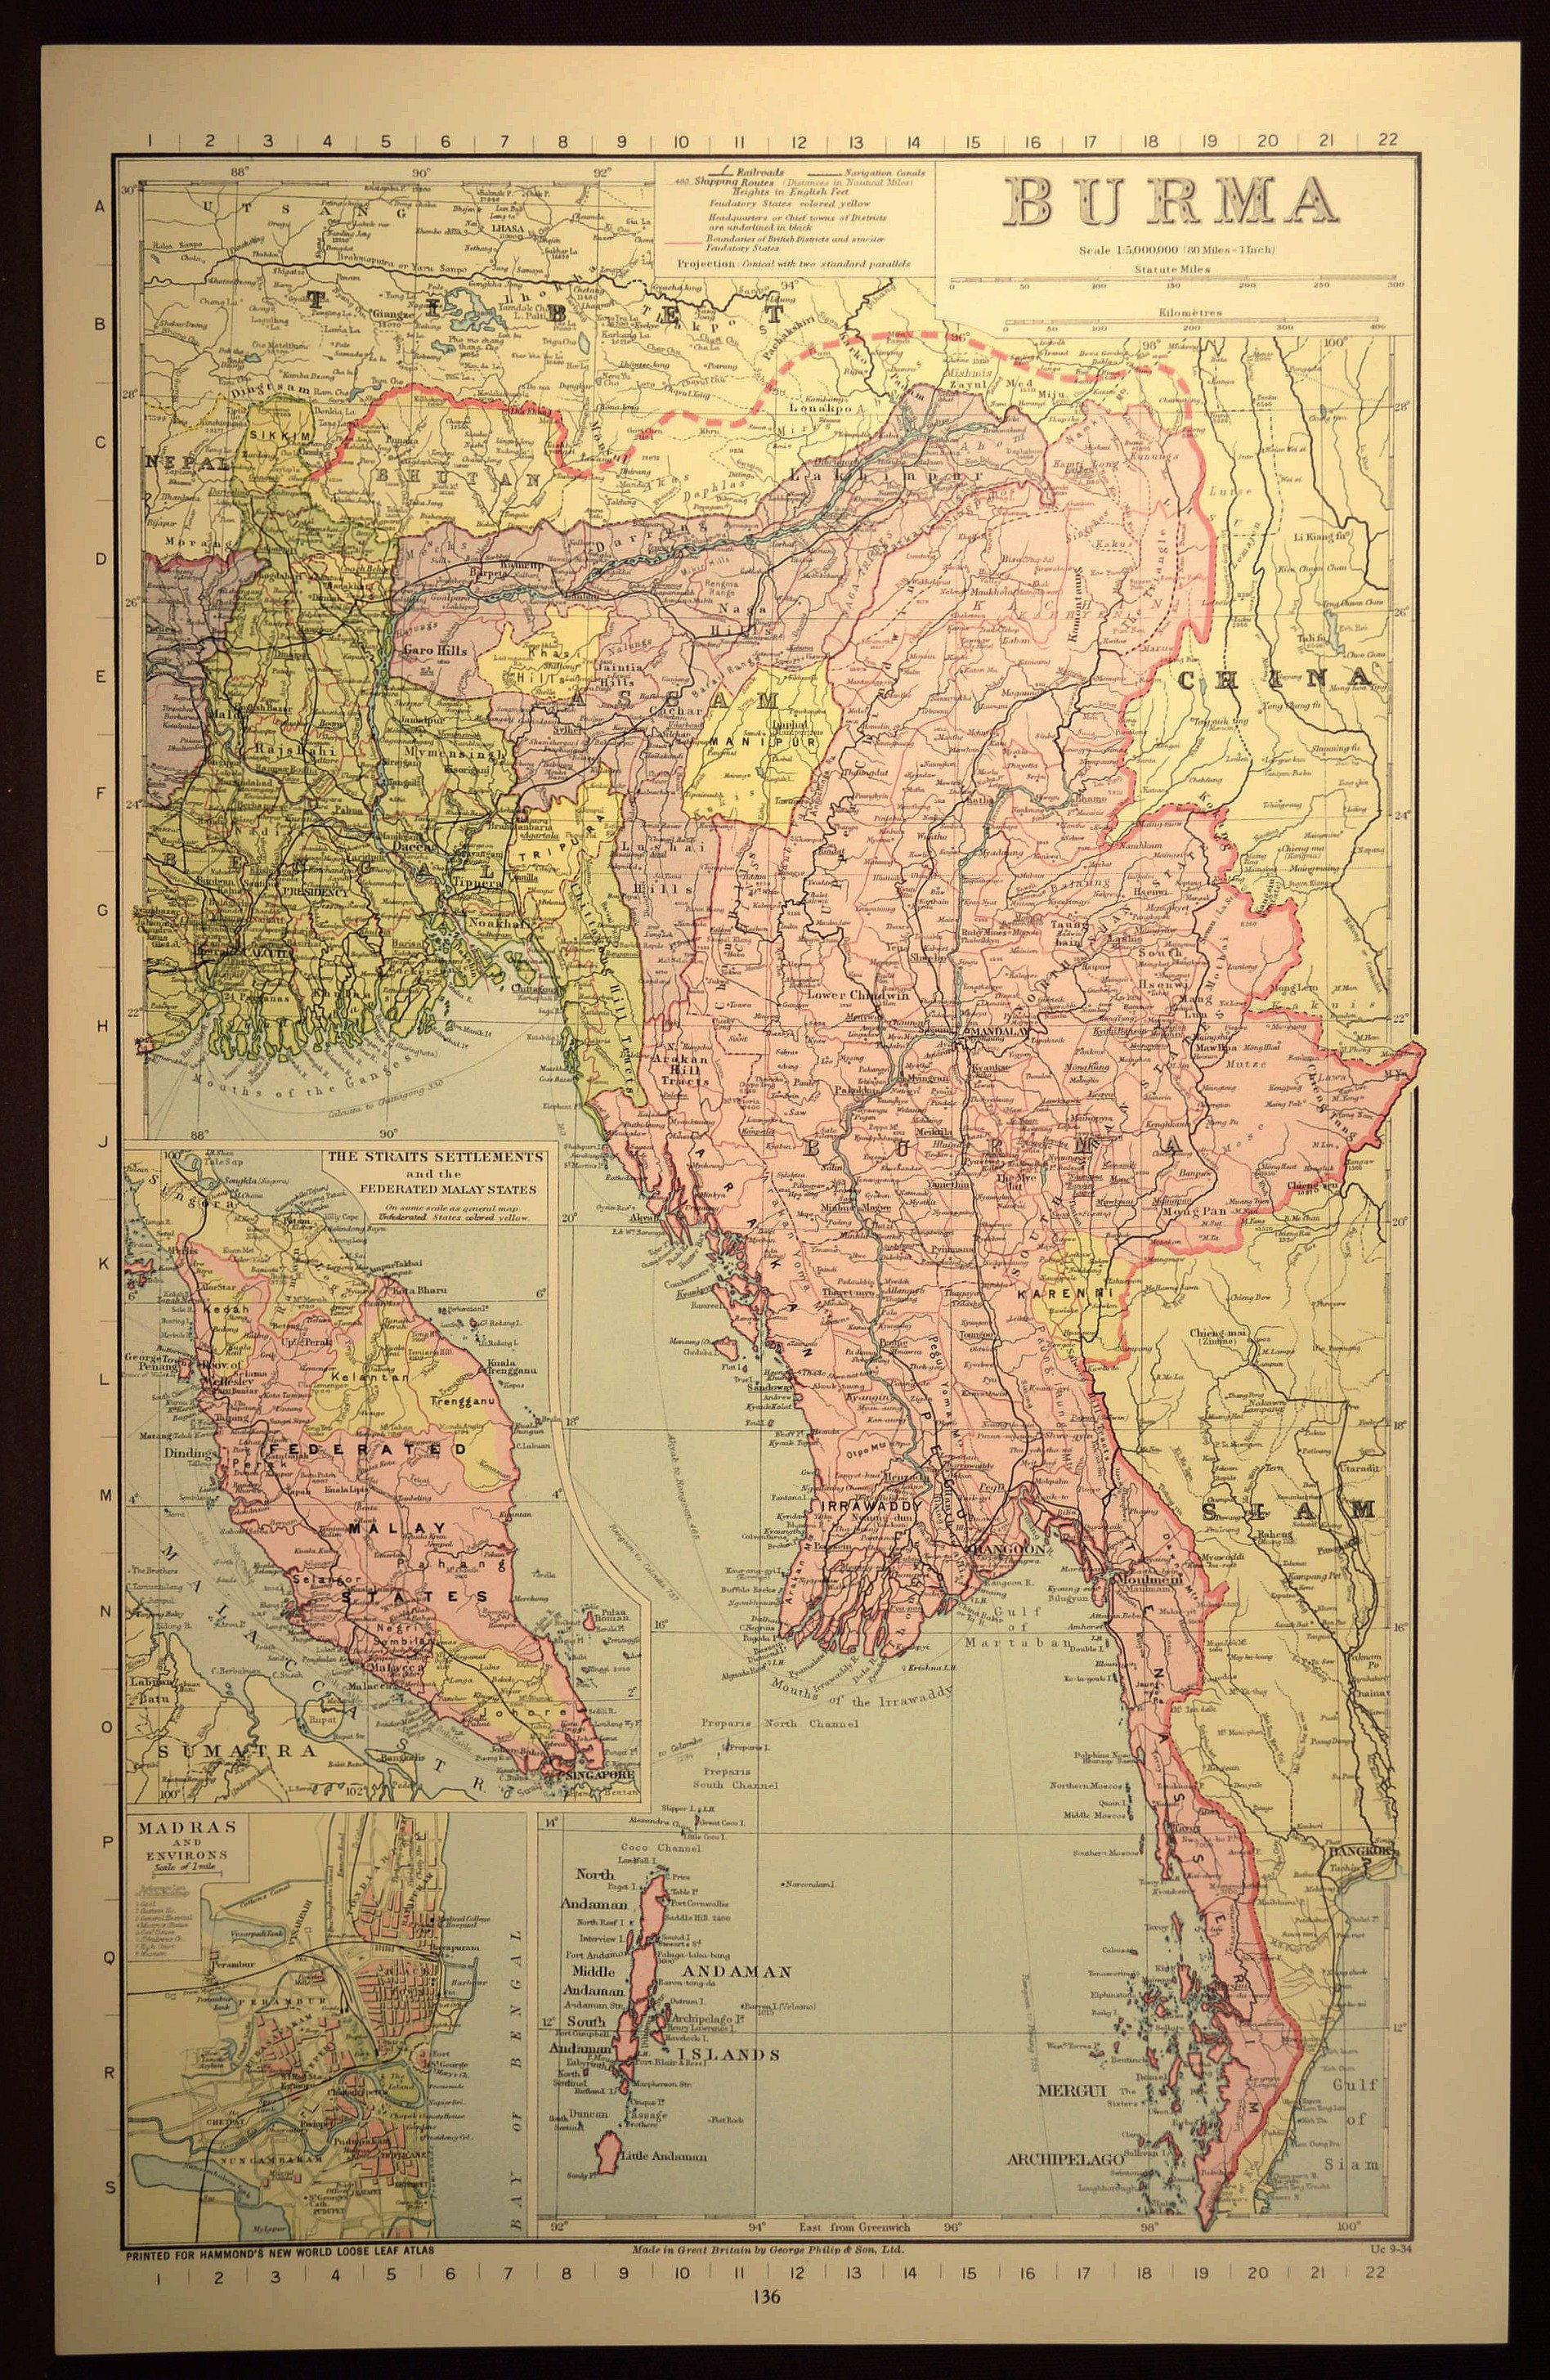 Burma Map of Burma Southeast Asia Calcutta Thailand Siam Map Wall